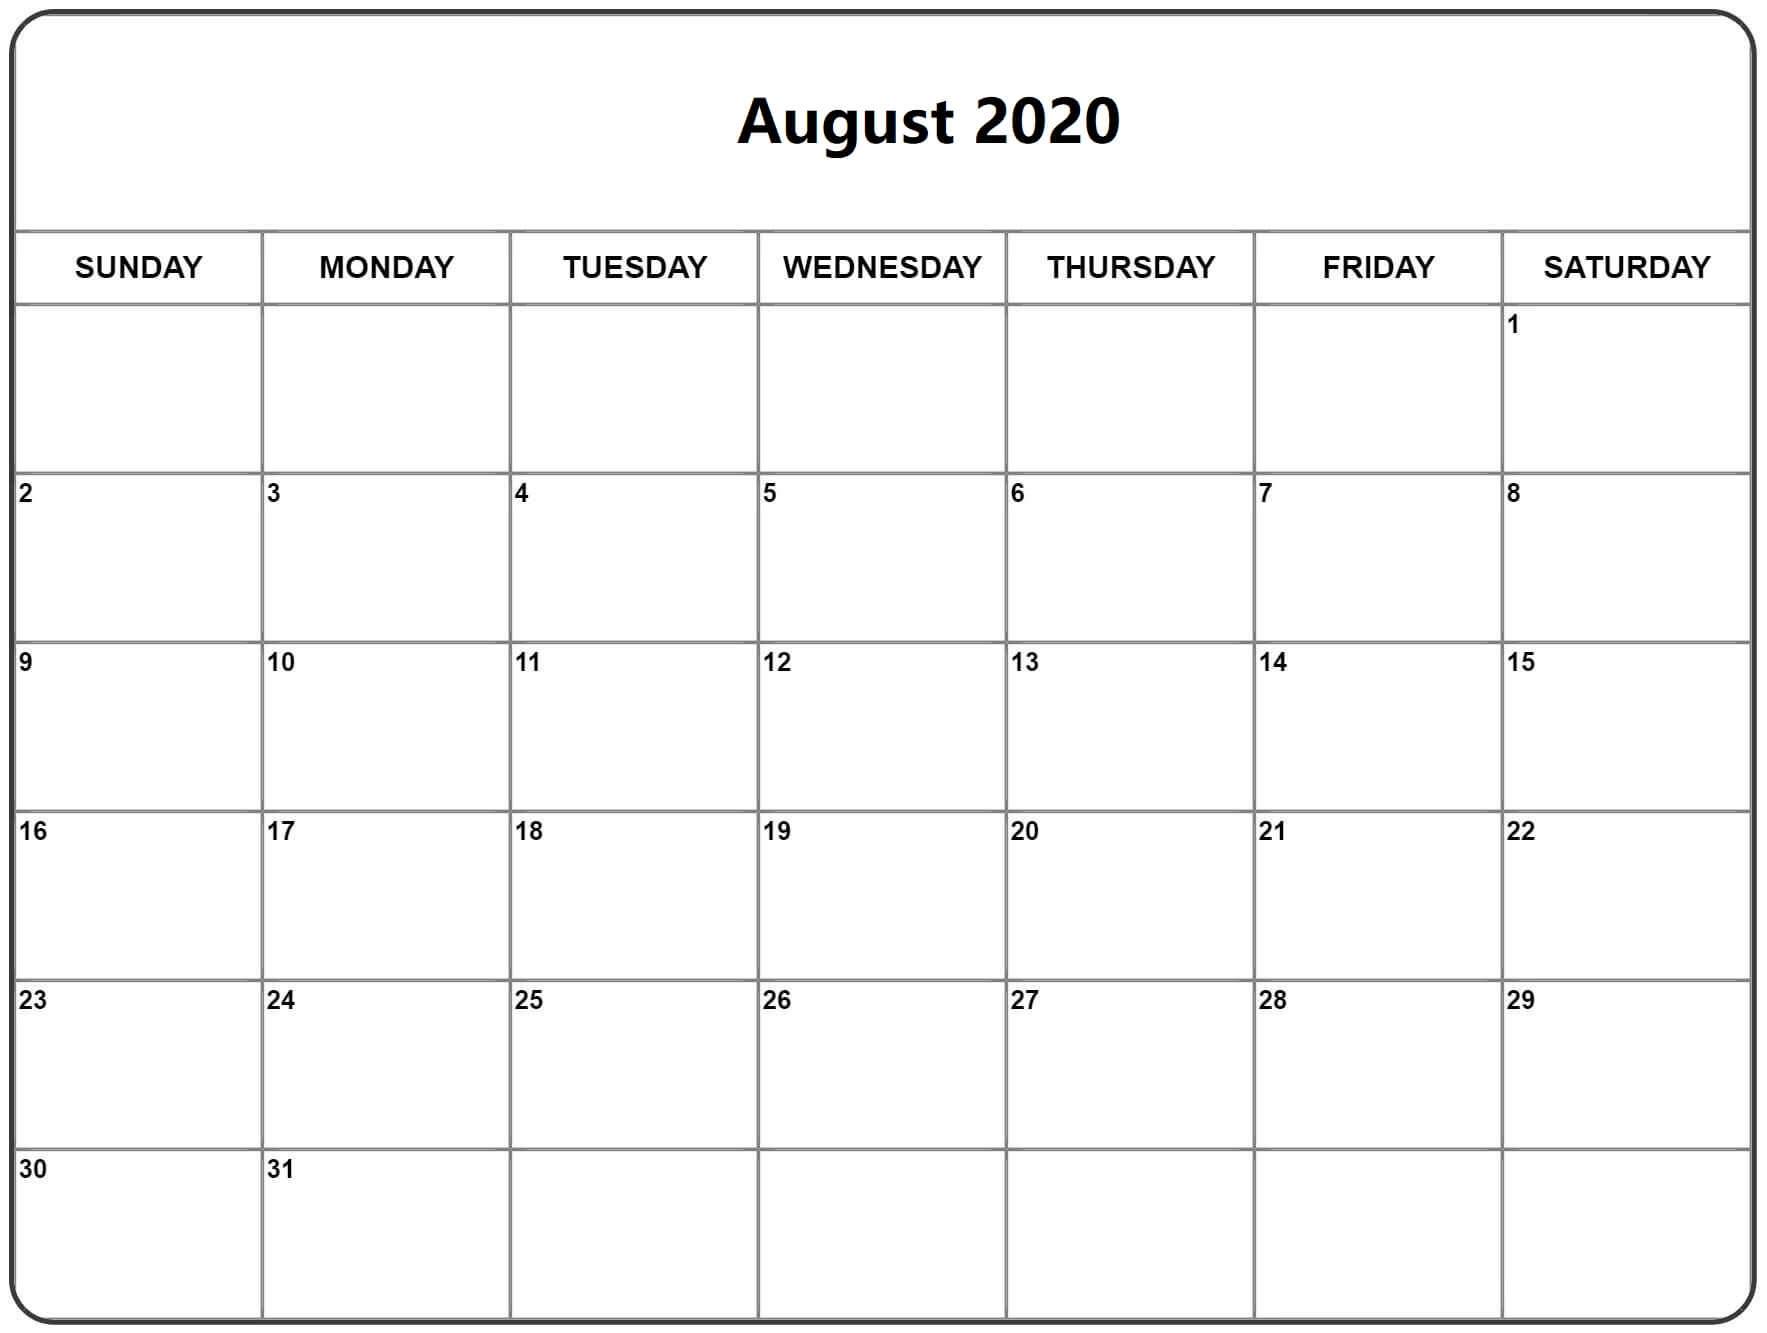 Excel August 2020 Calendar free